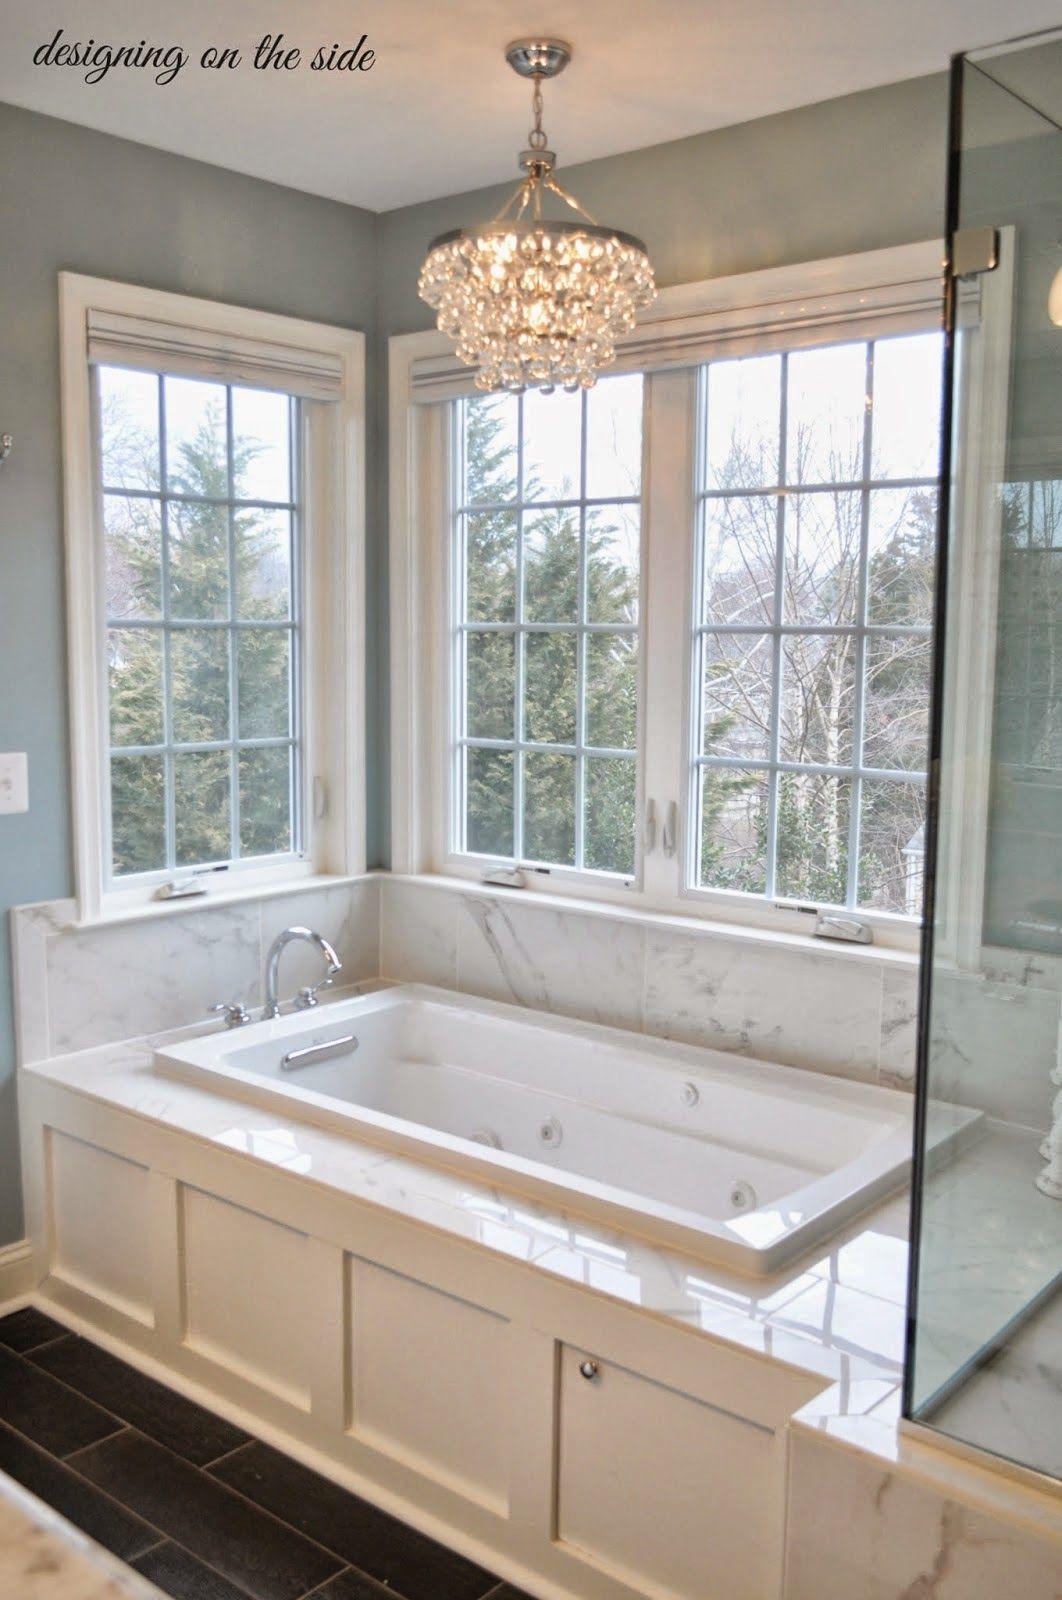 Simple Ideas For Creating A Gorgeous Master Bathroom Jon E Vac